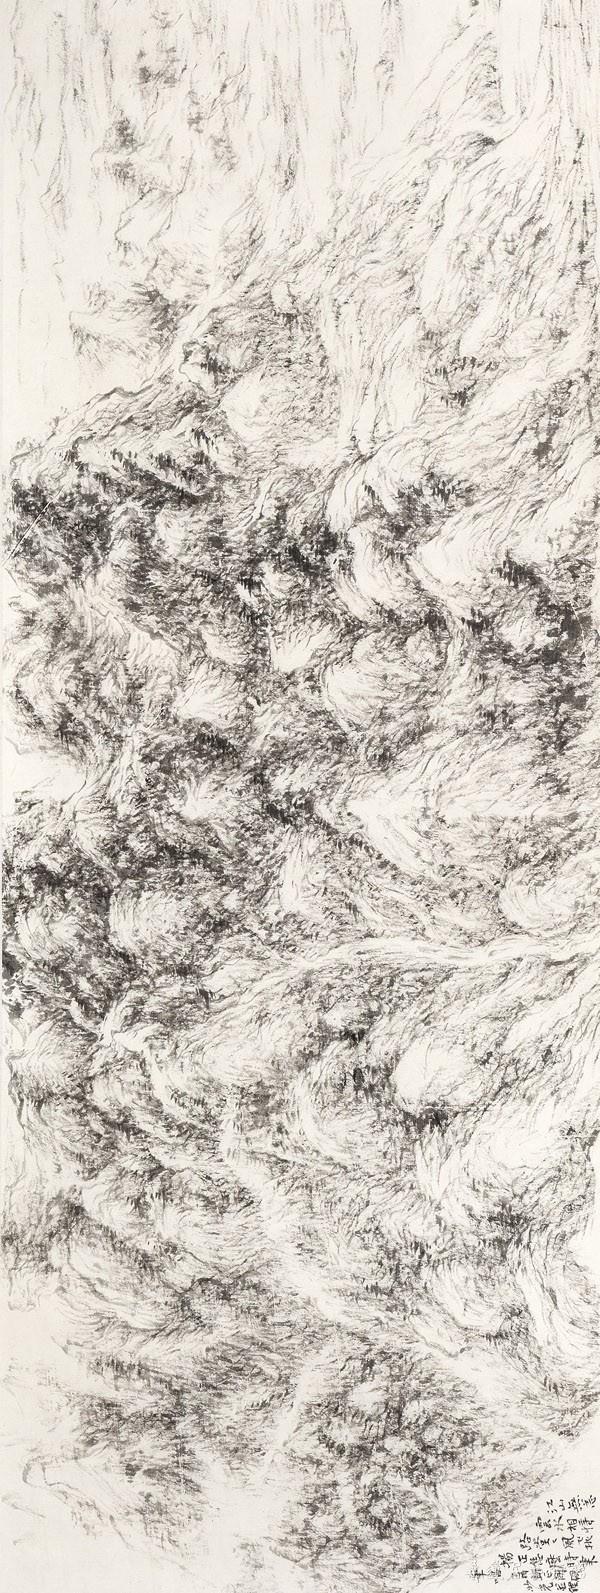 IMG_0170 山意水云间 缩图2 旋转